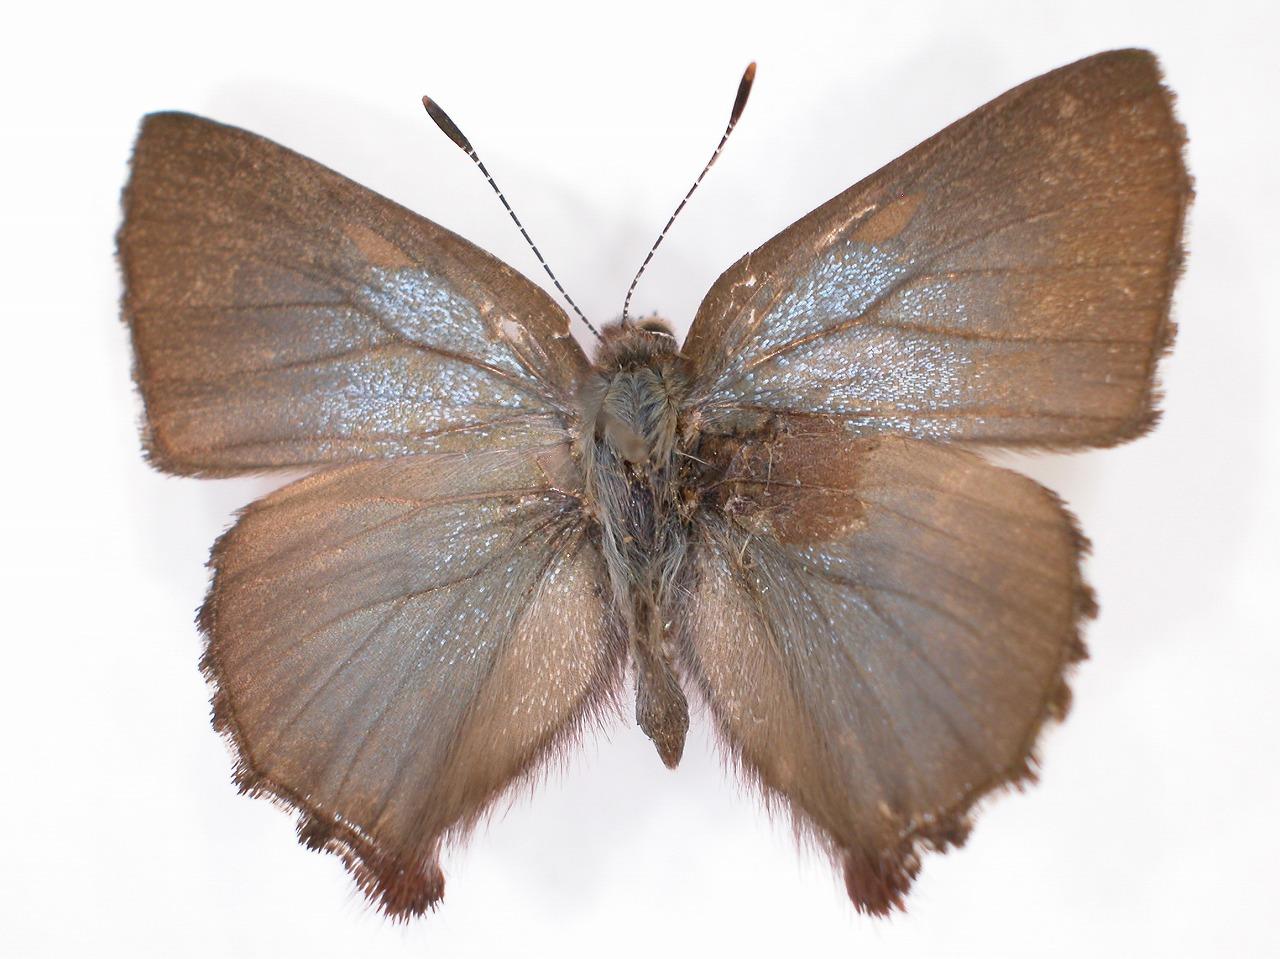 https://www.hitohaku.jp/material/l-material/butterfly-wing/5-lycaenidae/B1-637727_A.jpg